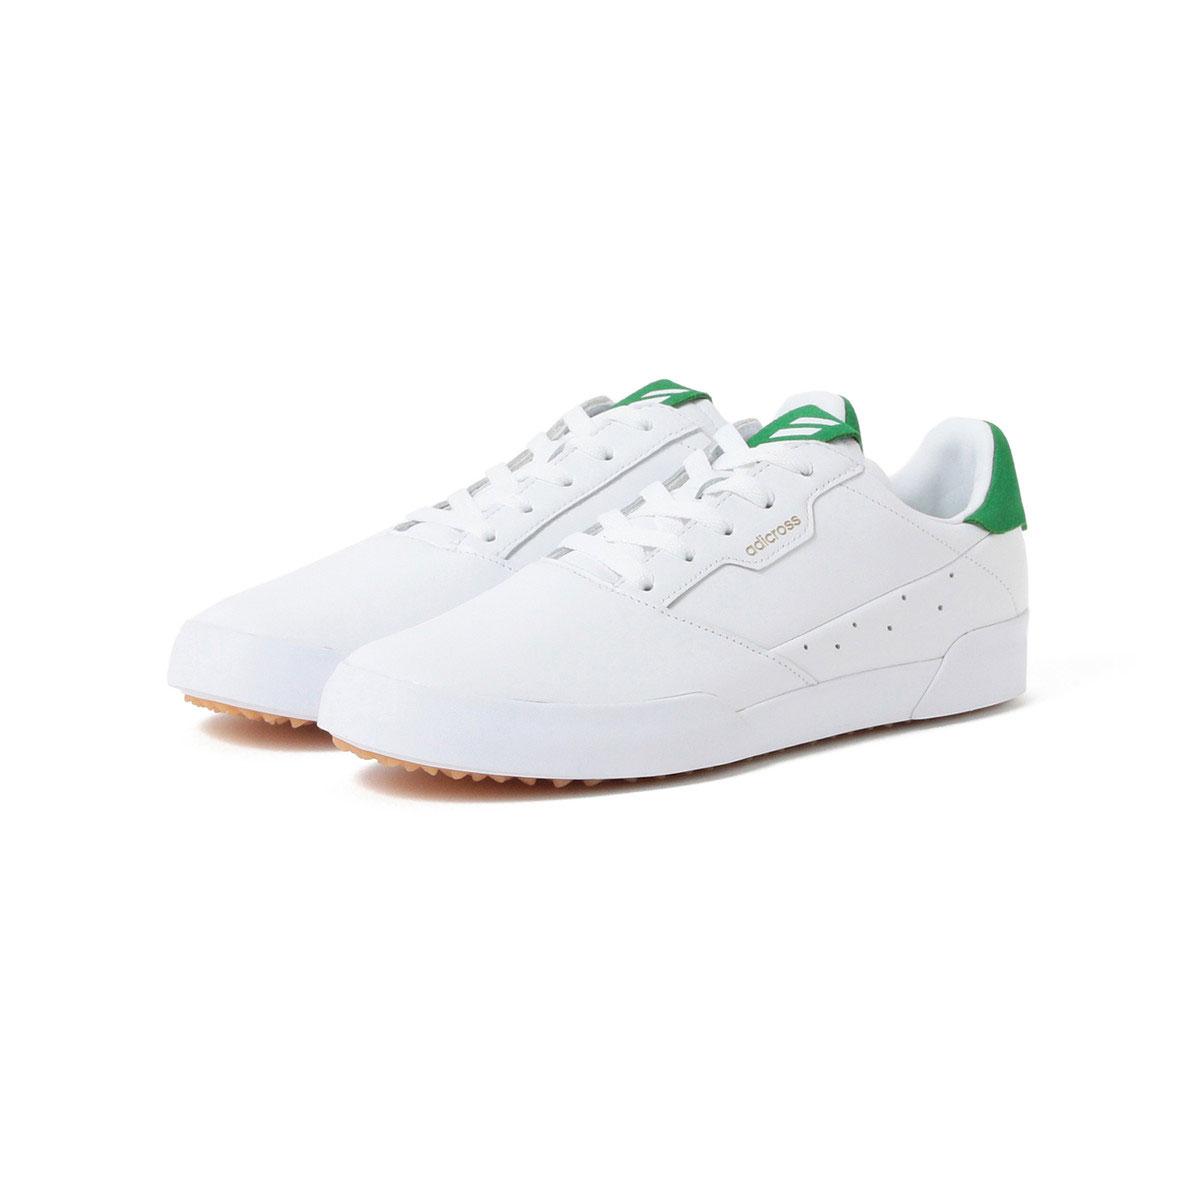 adidas Golf × BEAMS GOLF 別注 adicross retro ゴルフシューズ